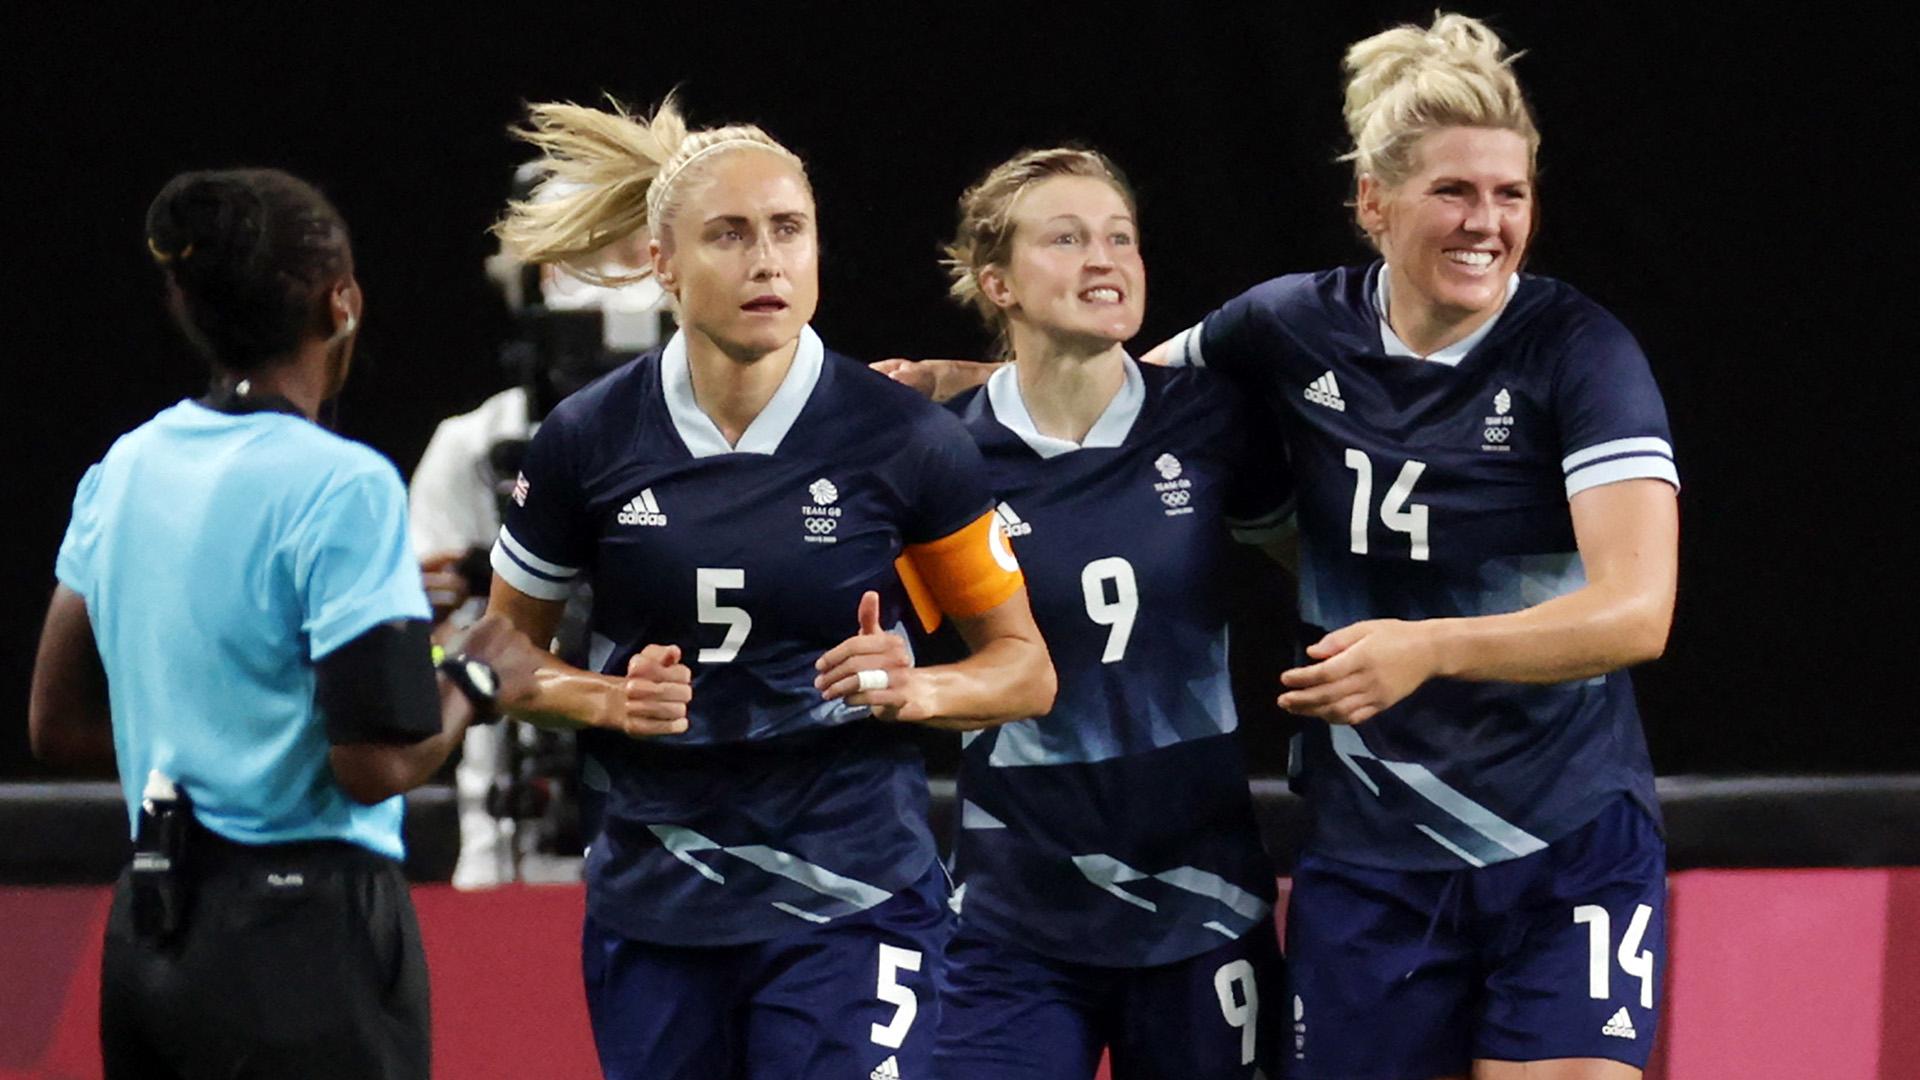 Tokyo 2020 Olympics women's football LIVE: Team GB seek quarter-final spot as USWNT look to bounce back